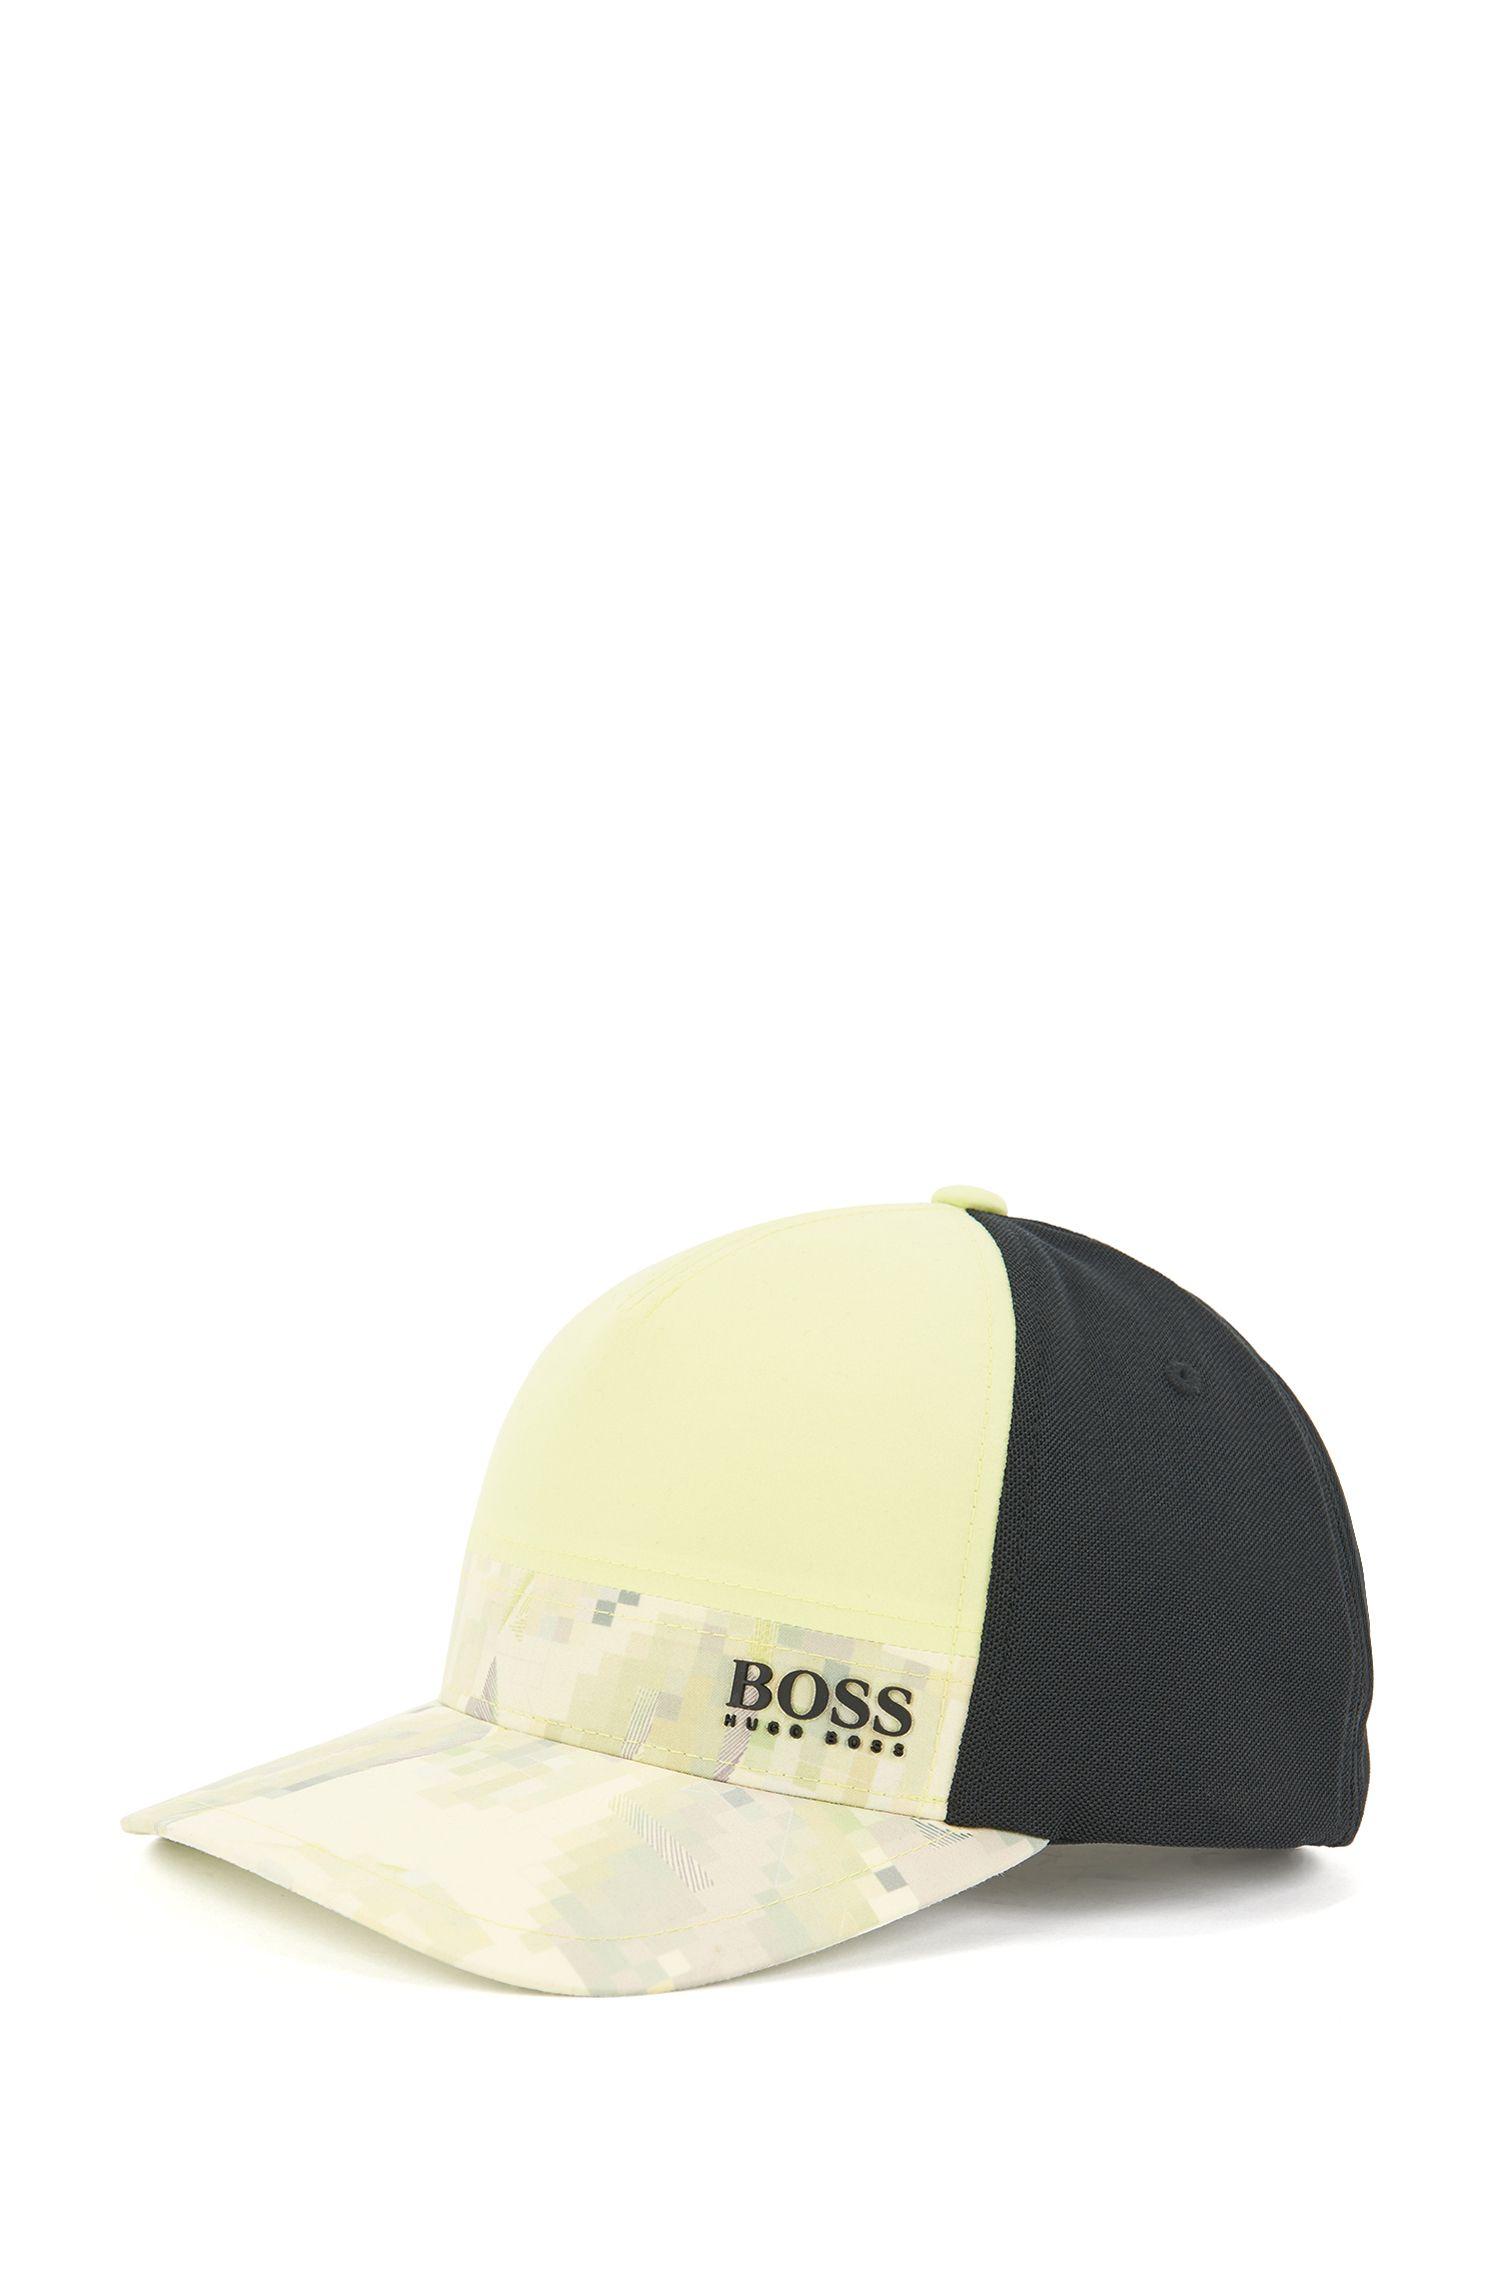 Digi-Camo Colorblock Baseball Cap | Printcap, Light Green